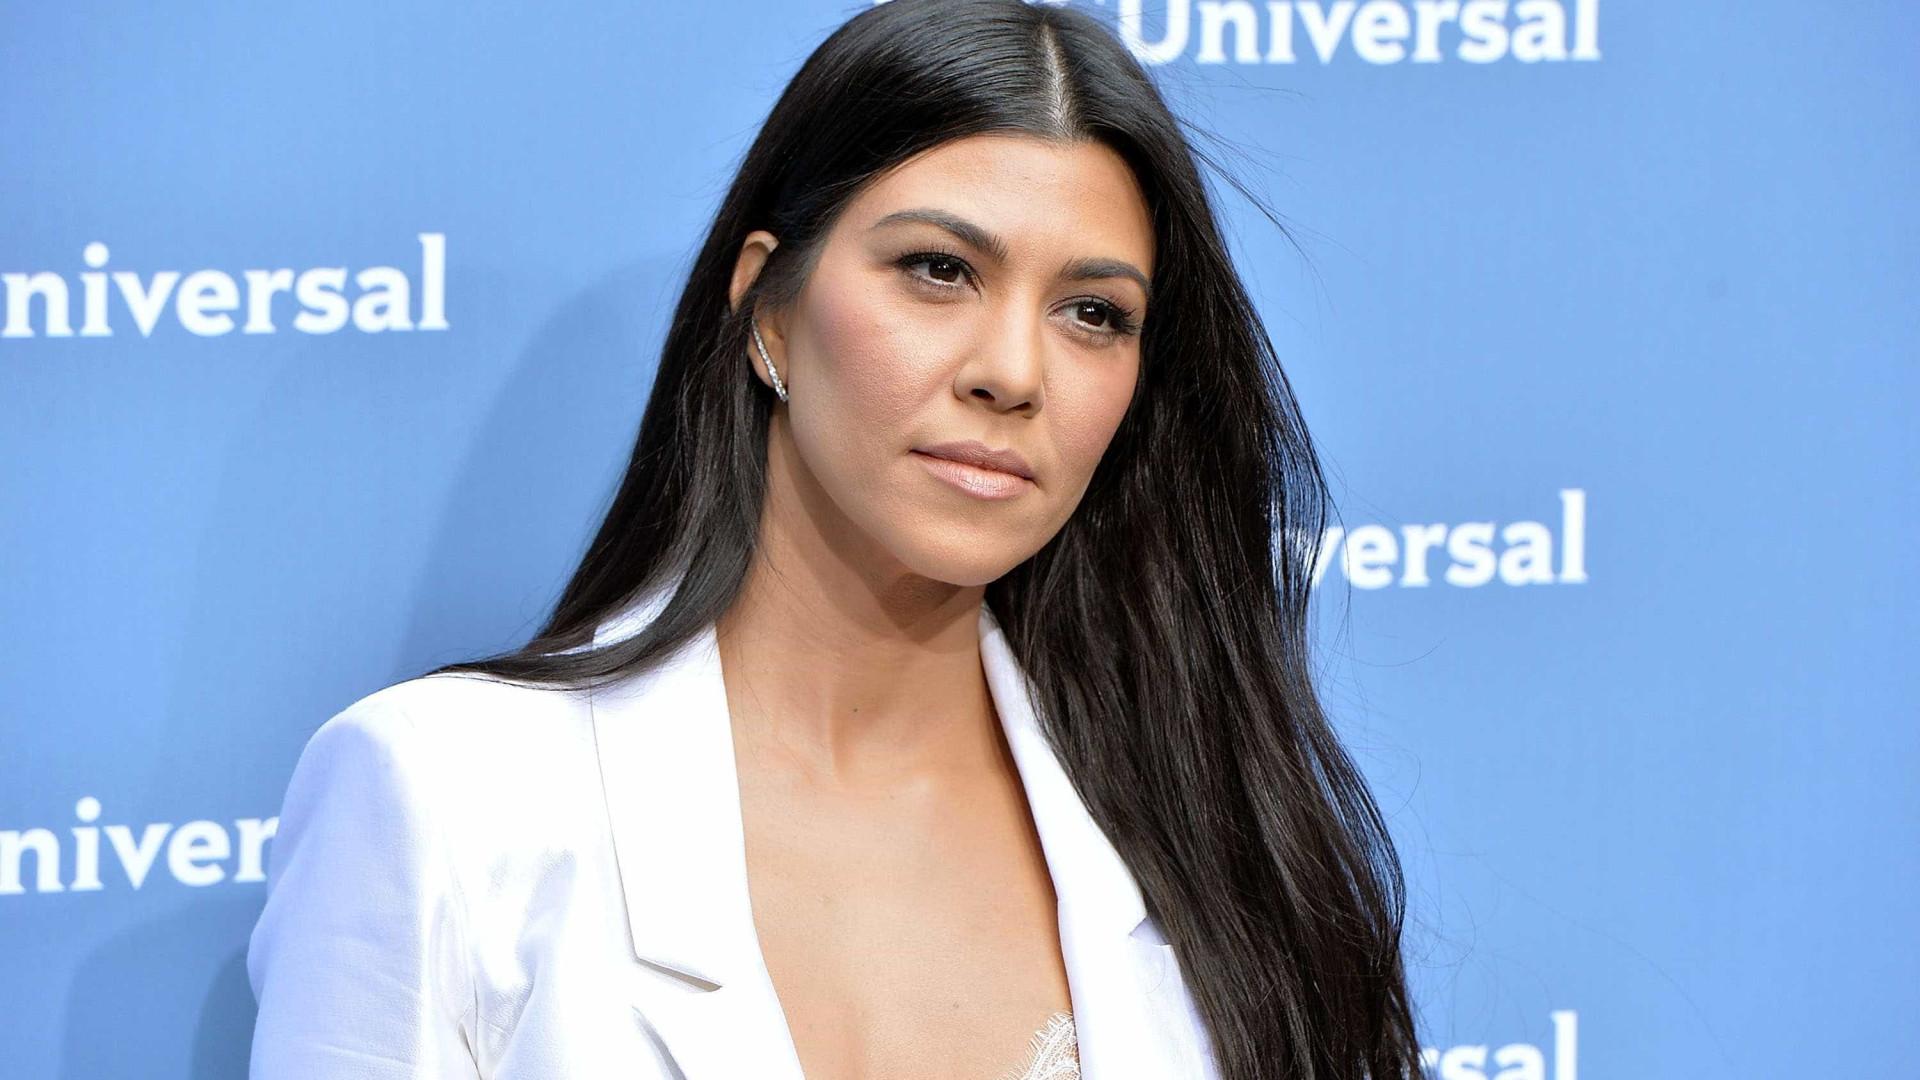 Kourtney Kardashian aventura-se no mundo da maquilhagem